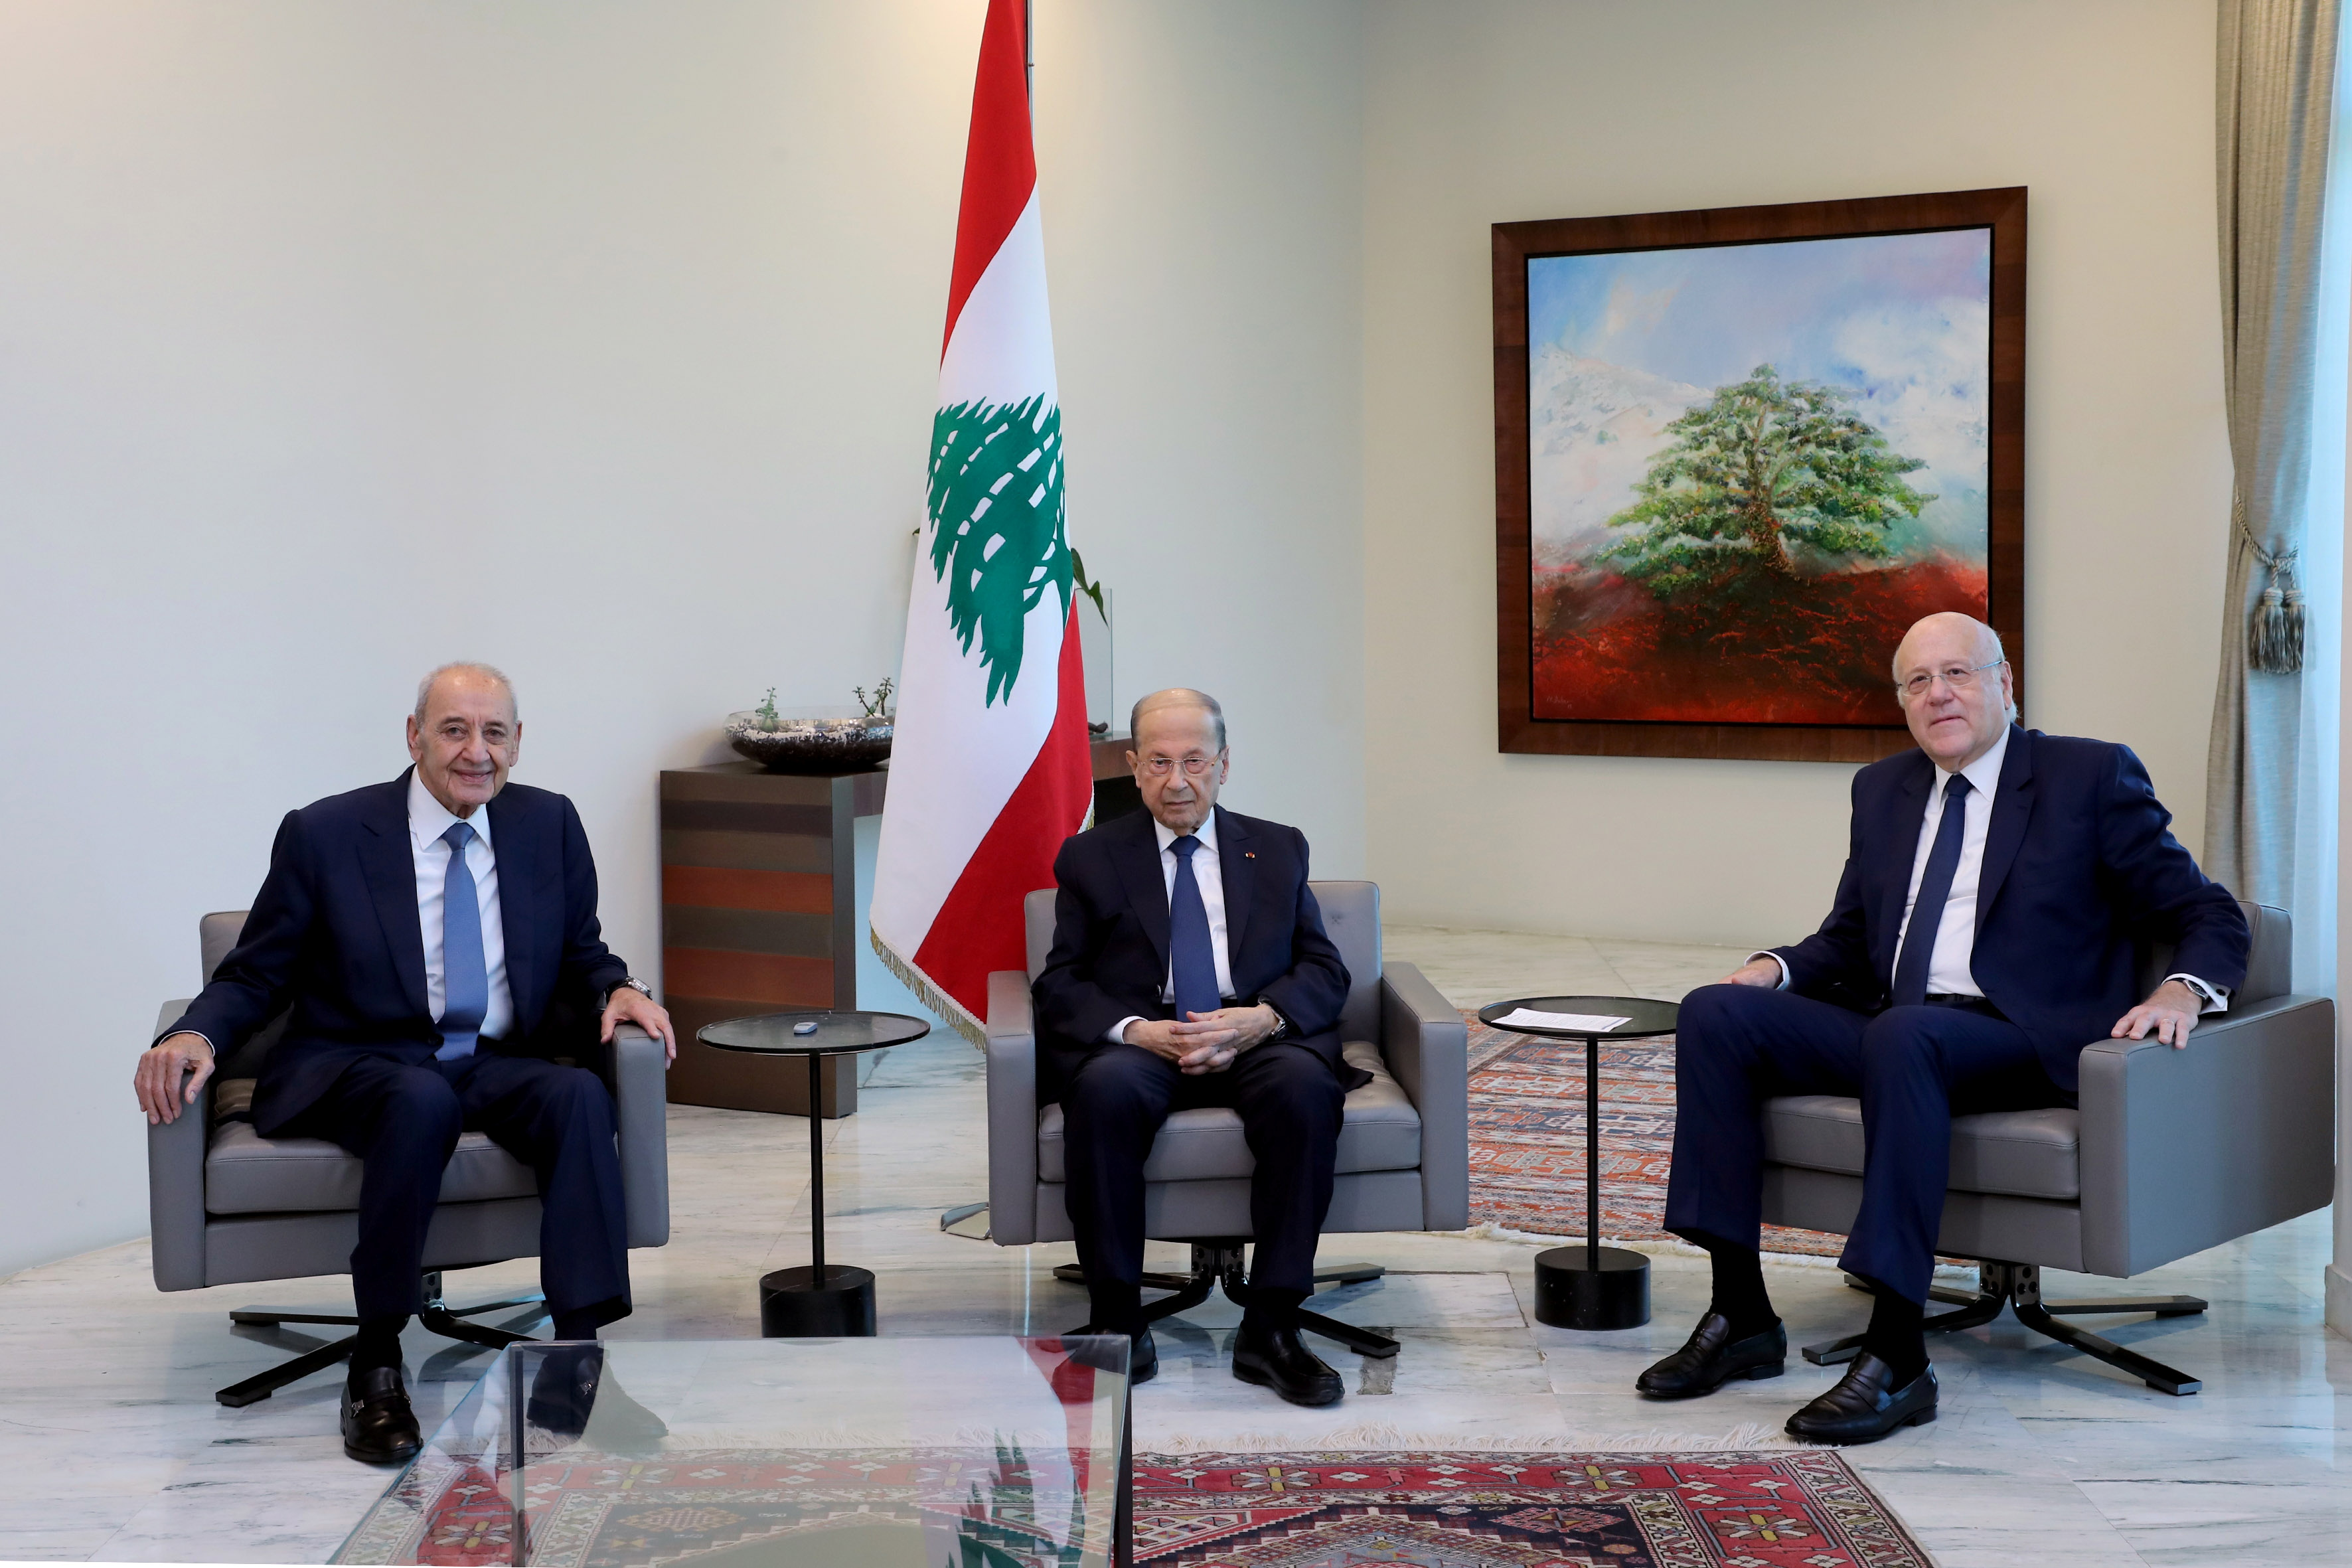 Lebanon's President Michel Aoun meets with Lebanese Prime Minister Najib Mikati and Lebanese Speaker of the Parliament Nabih Berri at the presidential palace in Baabda, Lebanon September 13, 2021. Dalati Nohra/Handout via REUTERS